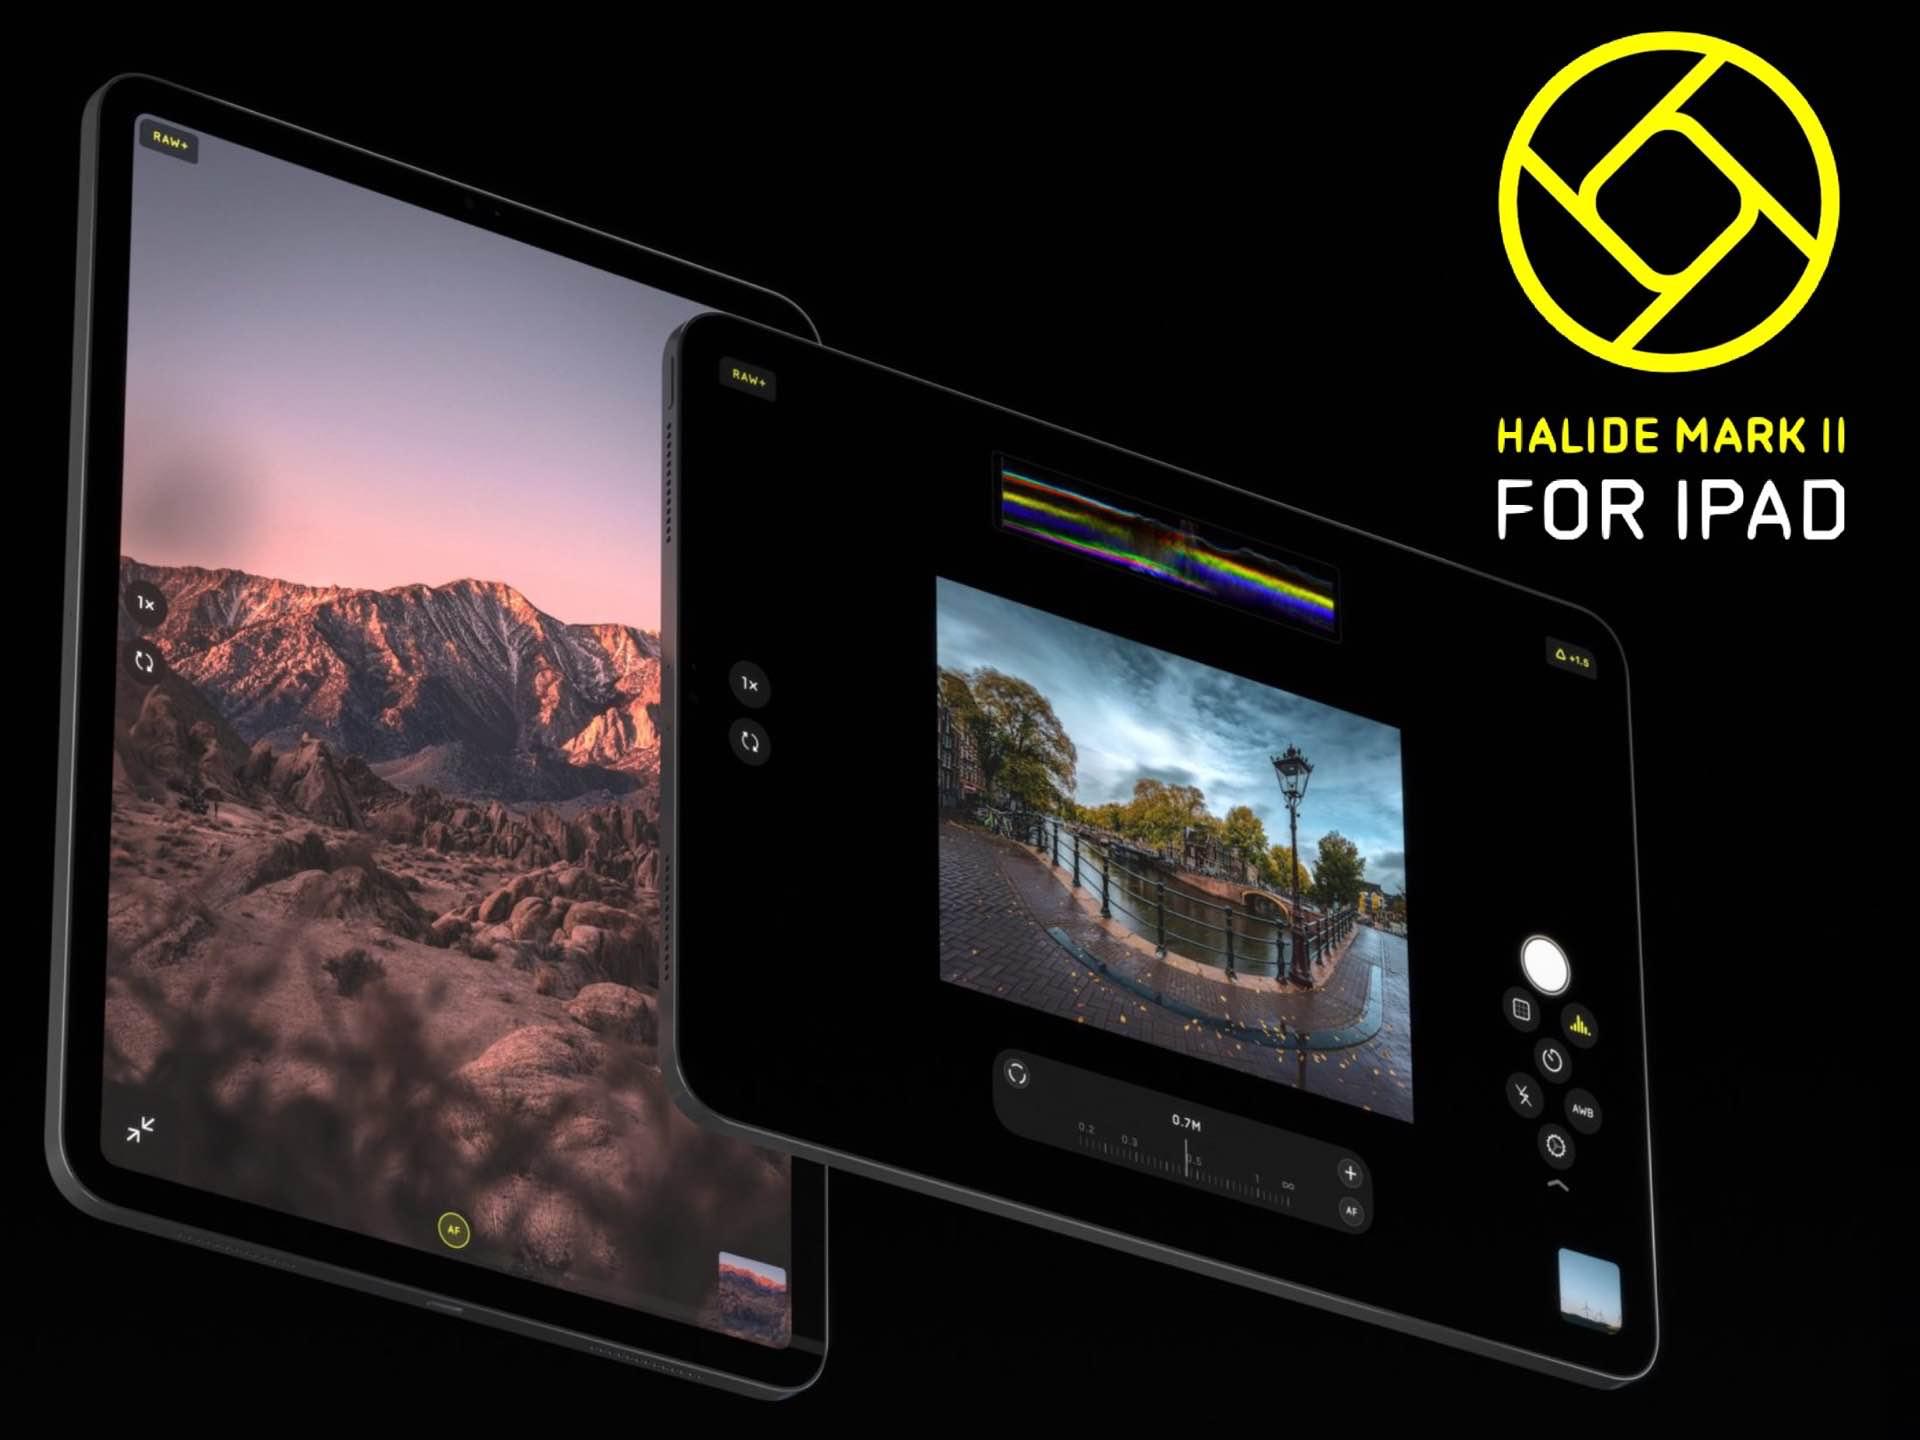 Lux Releases Halide Mark II for iPad